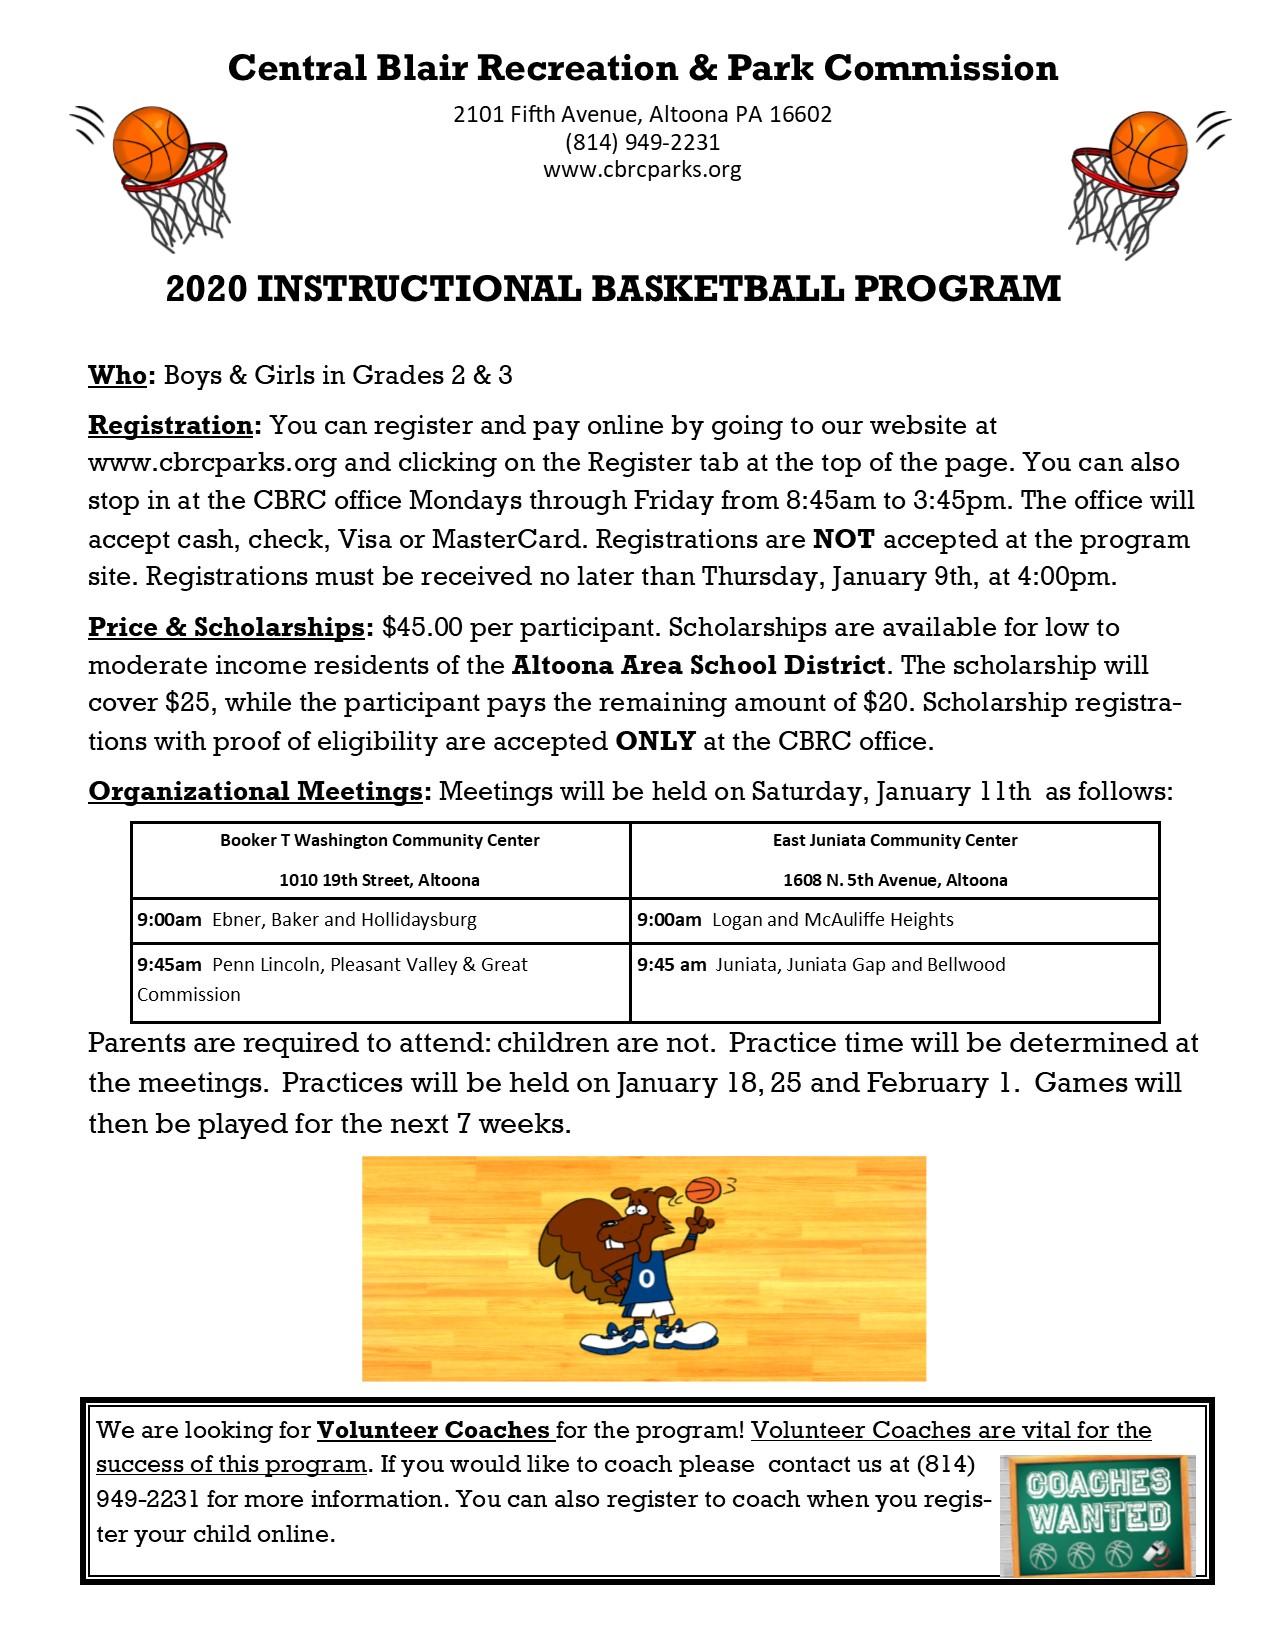 Instructional-basketball